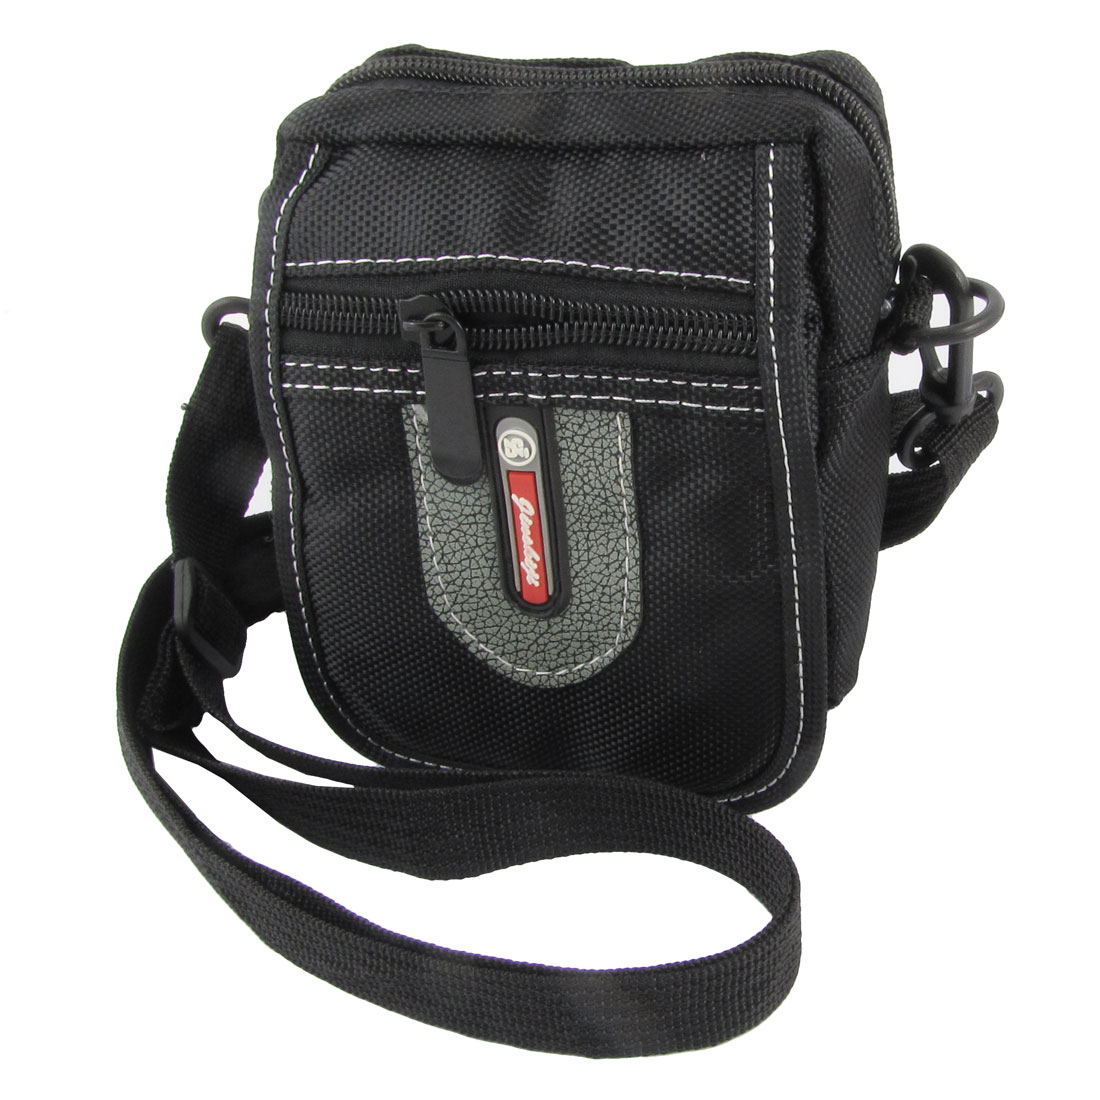 Man Black Gray Faux Leather Decor 3 Pockets Adjustable Strap Waist Bag